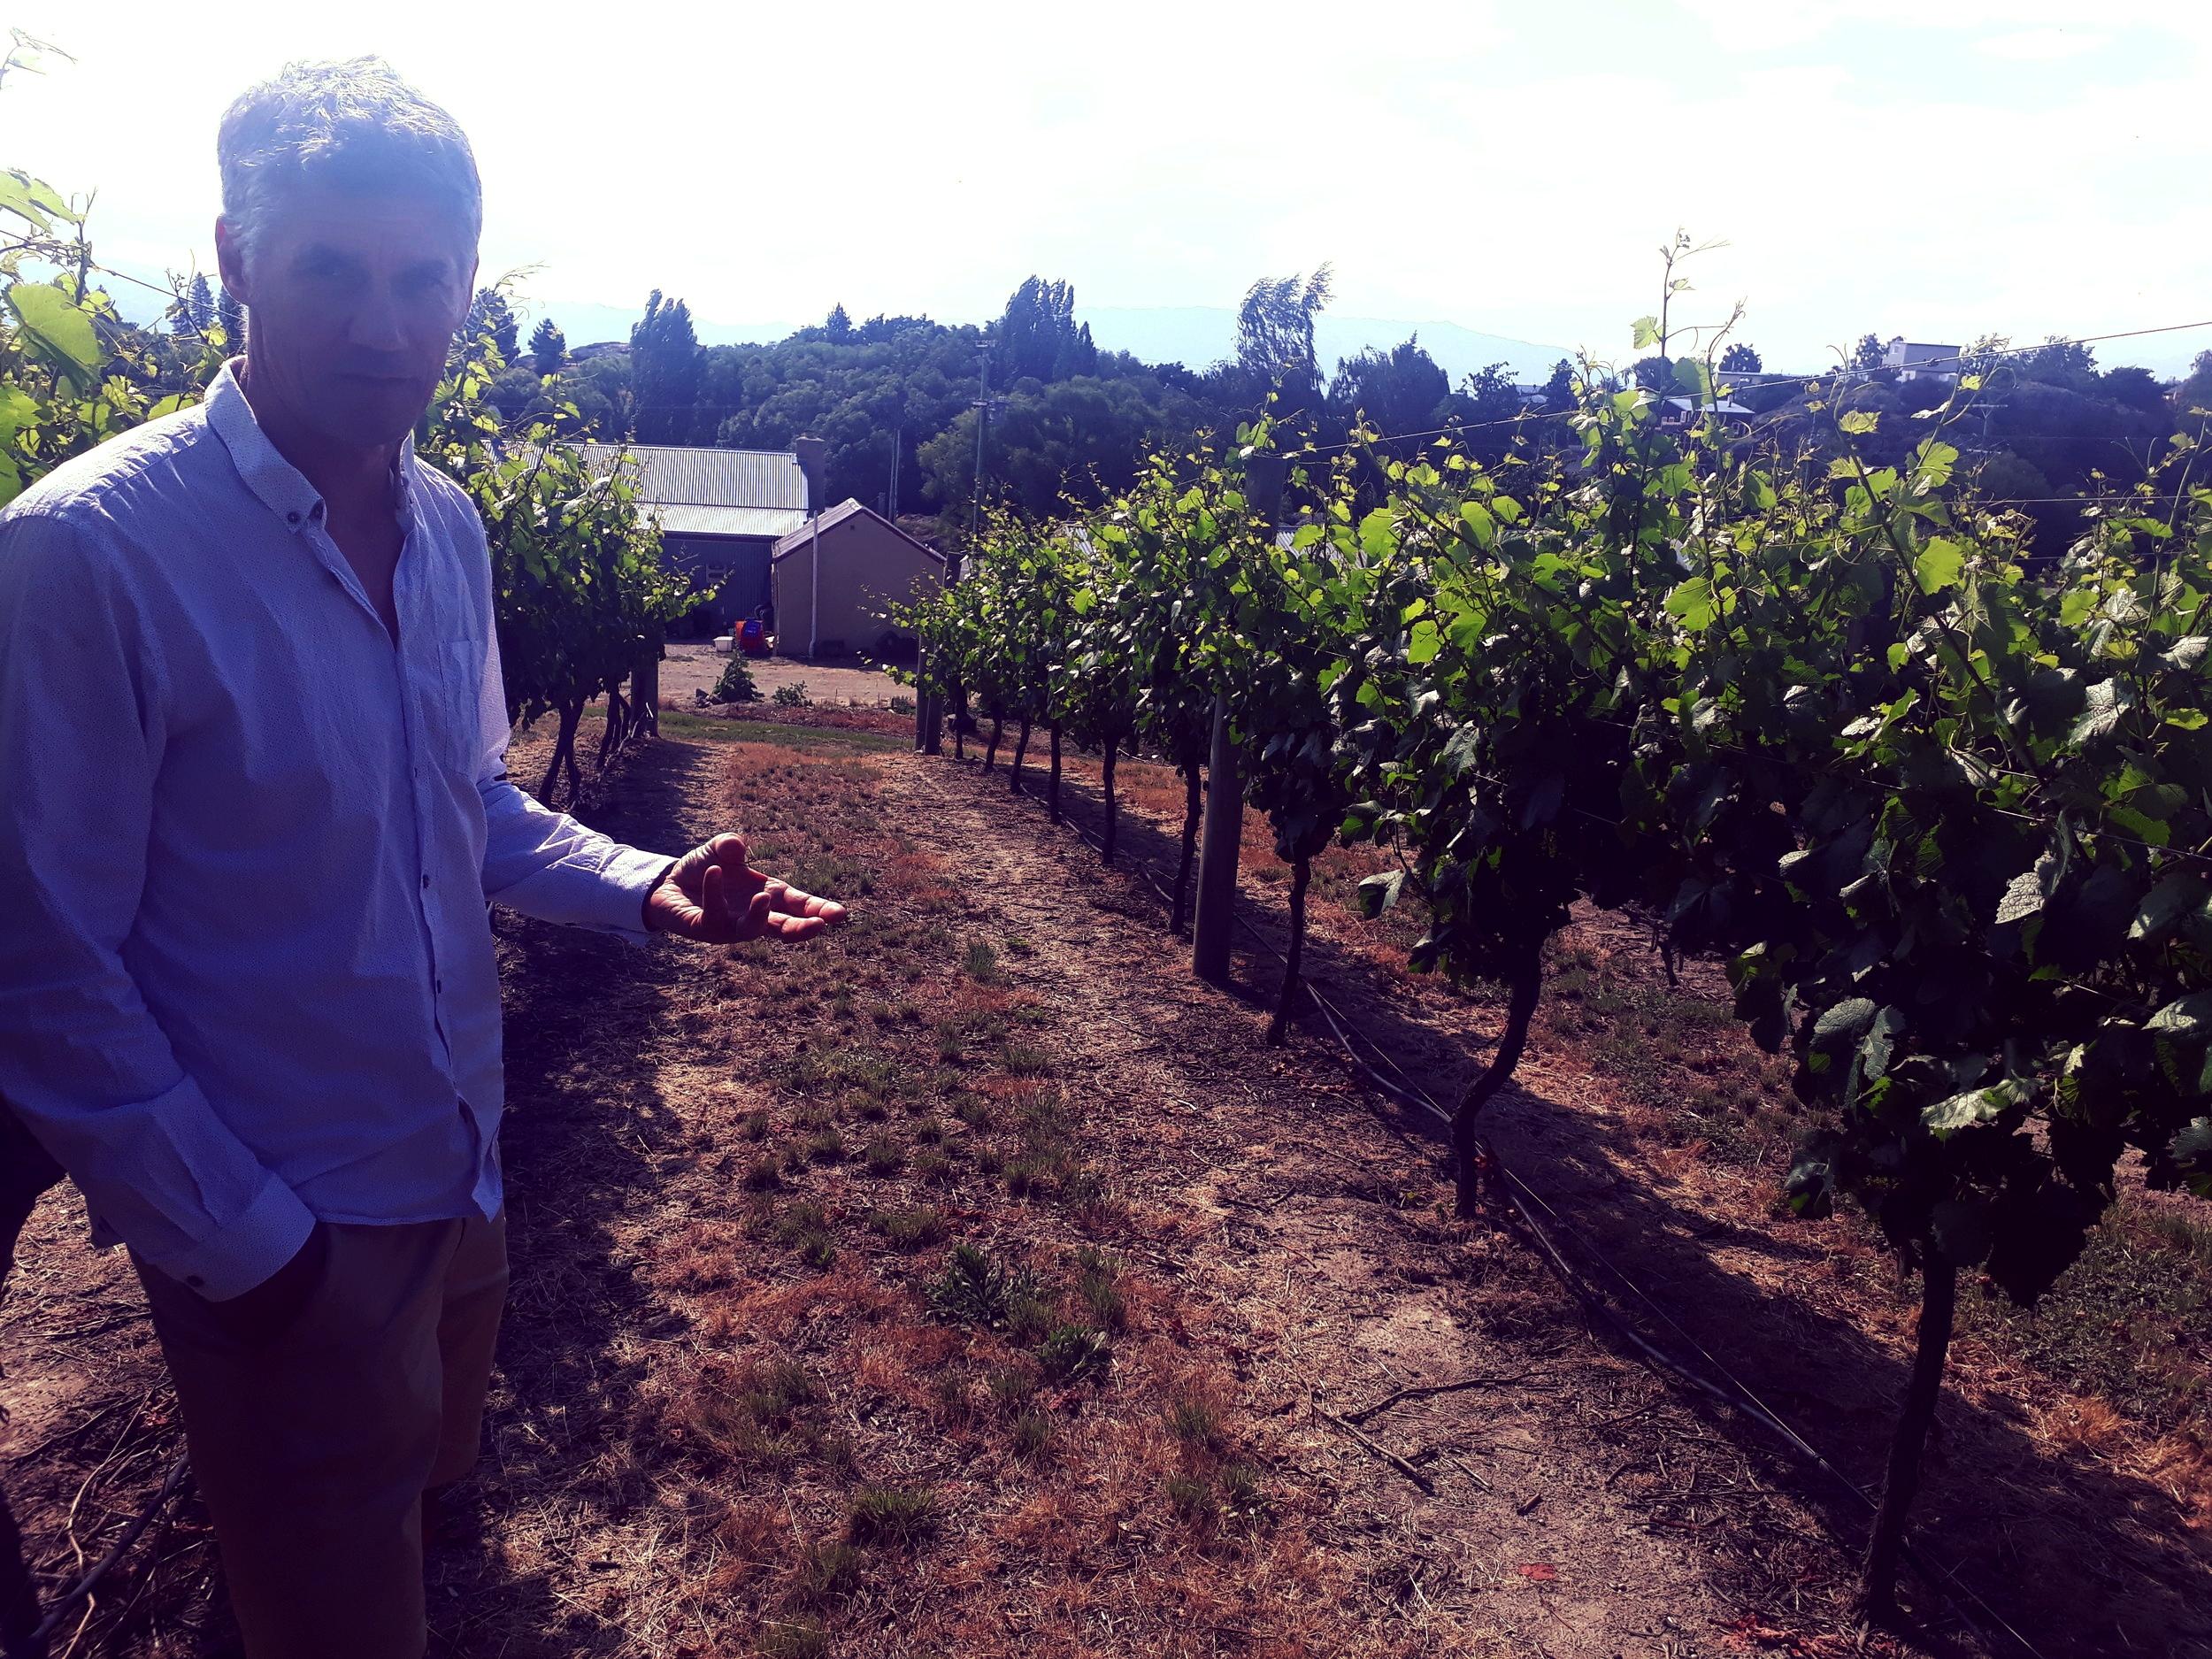 Dave Grant shows us through Shaky Bridge's vineyard